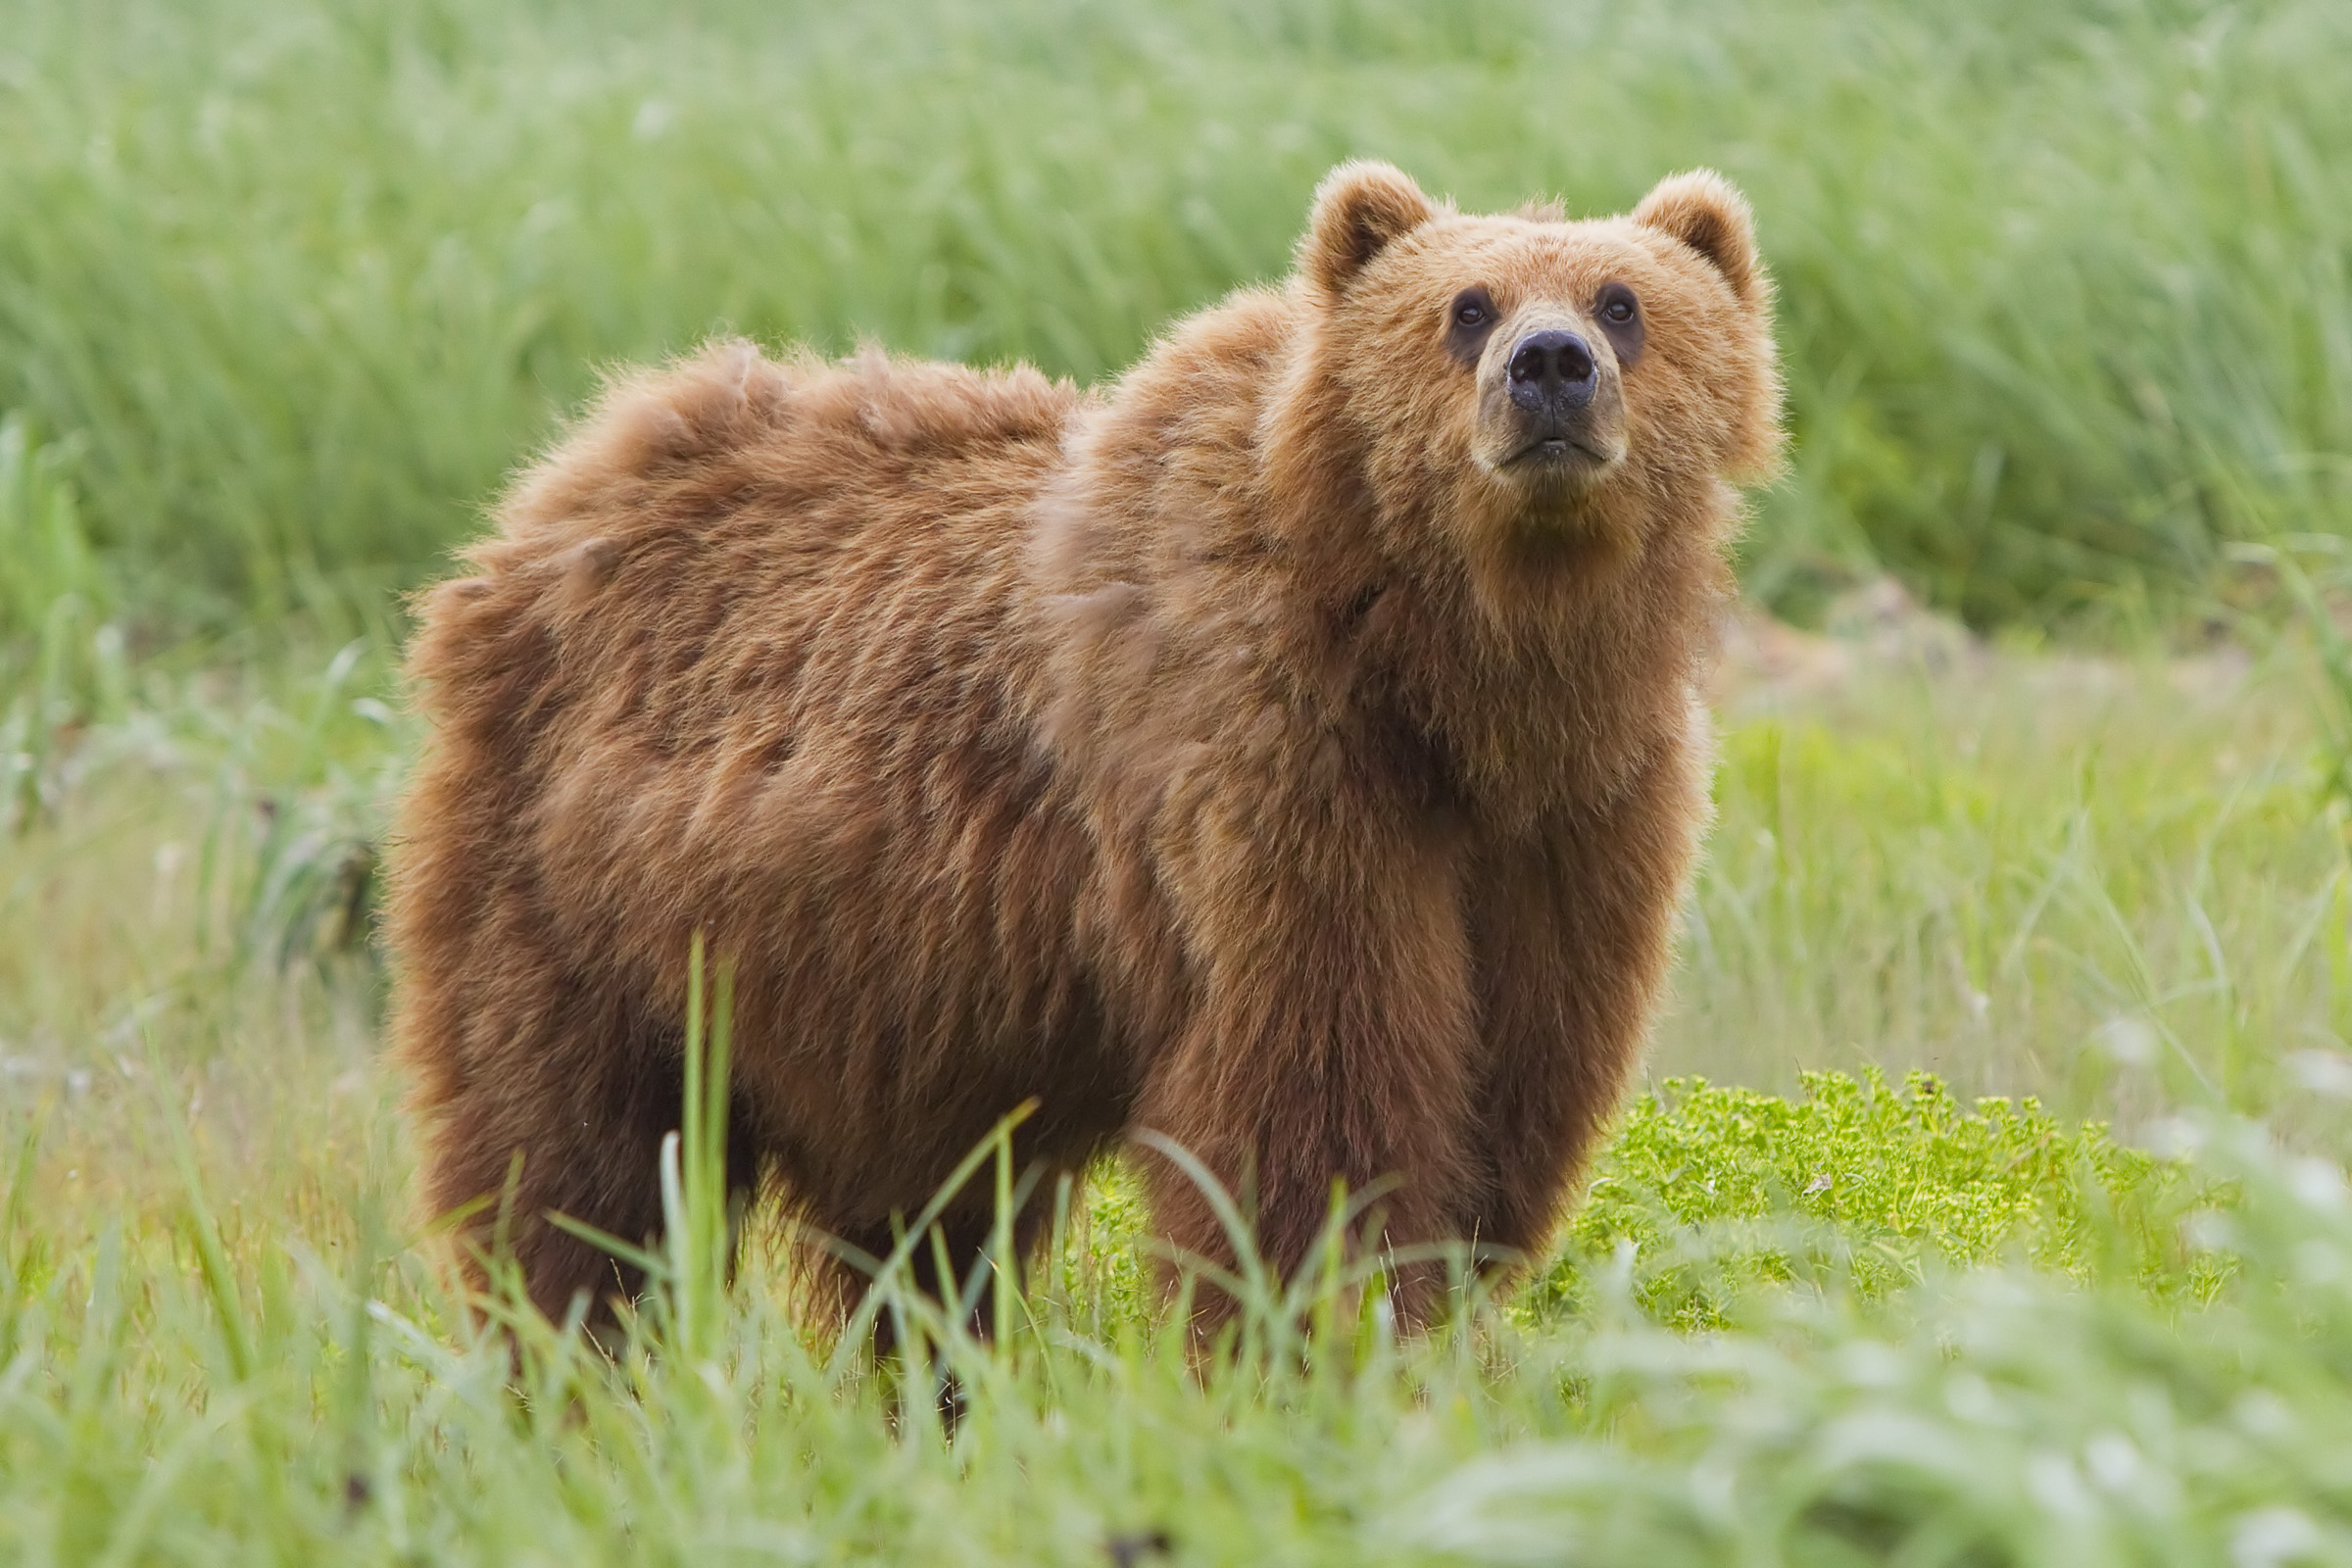 bear wikipedia